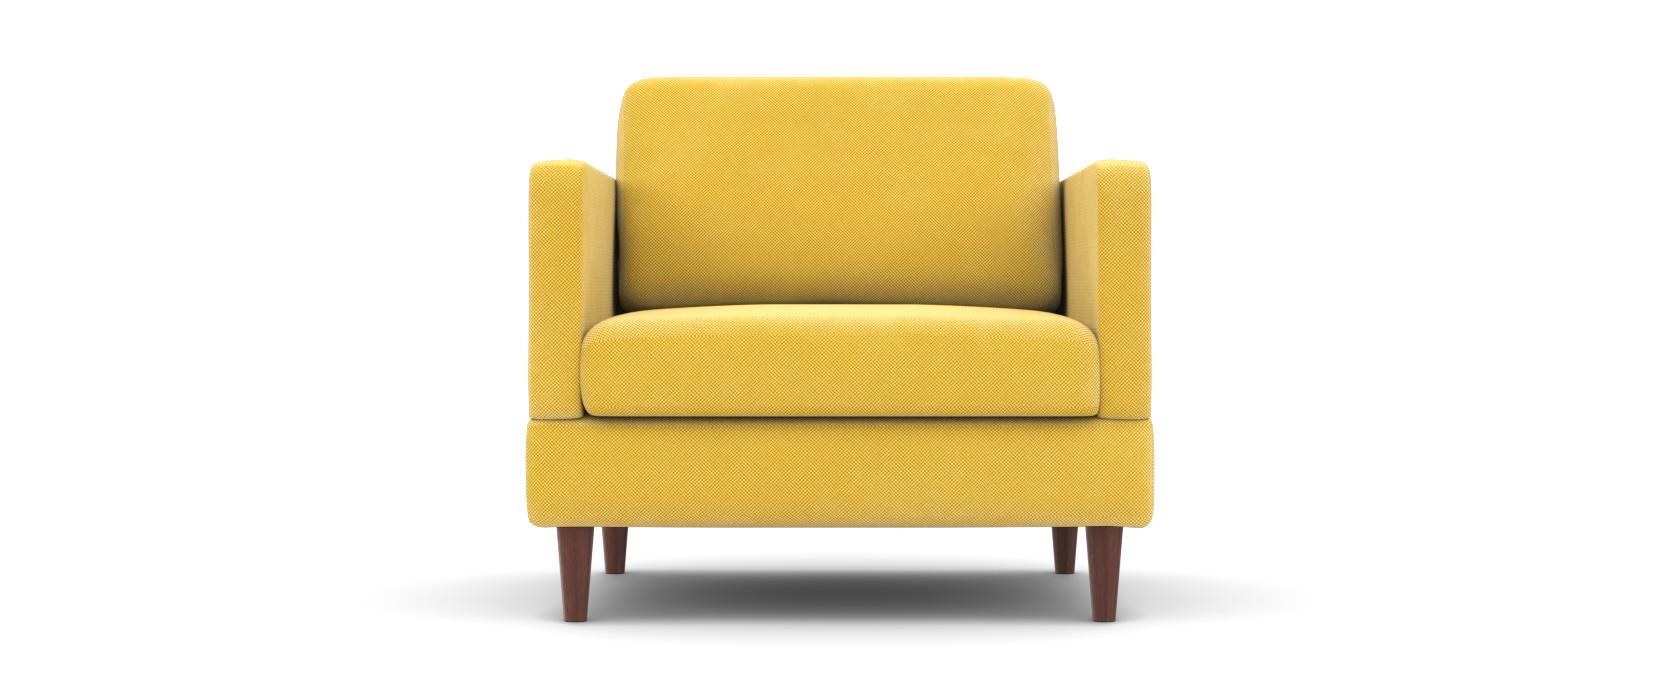 Кресло Bruno Club - Фото 1 - Pufetto